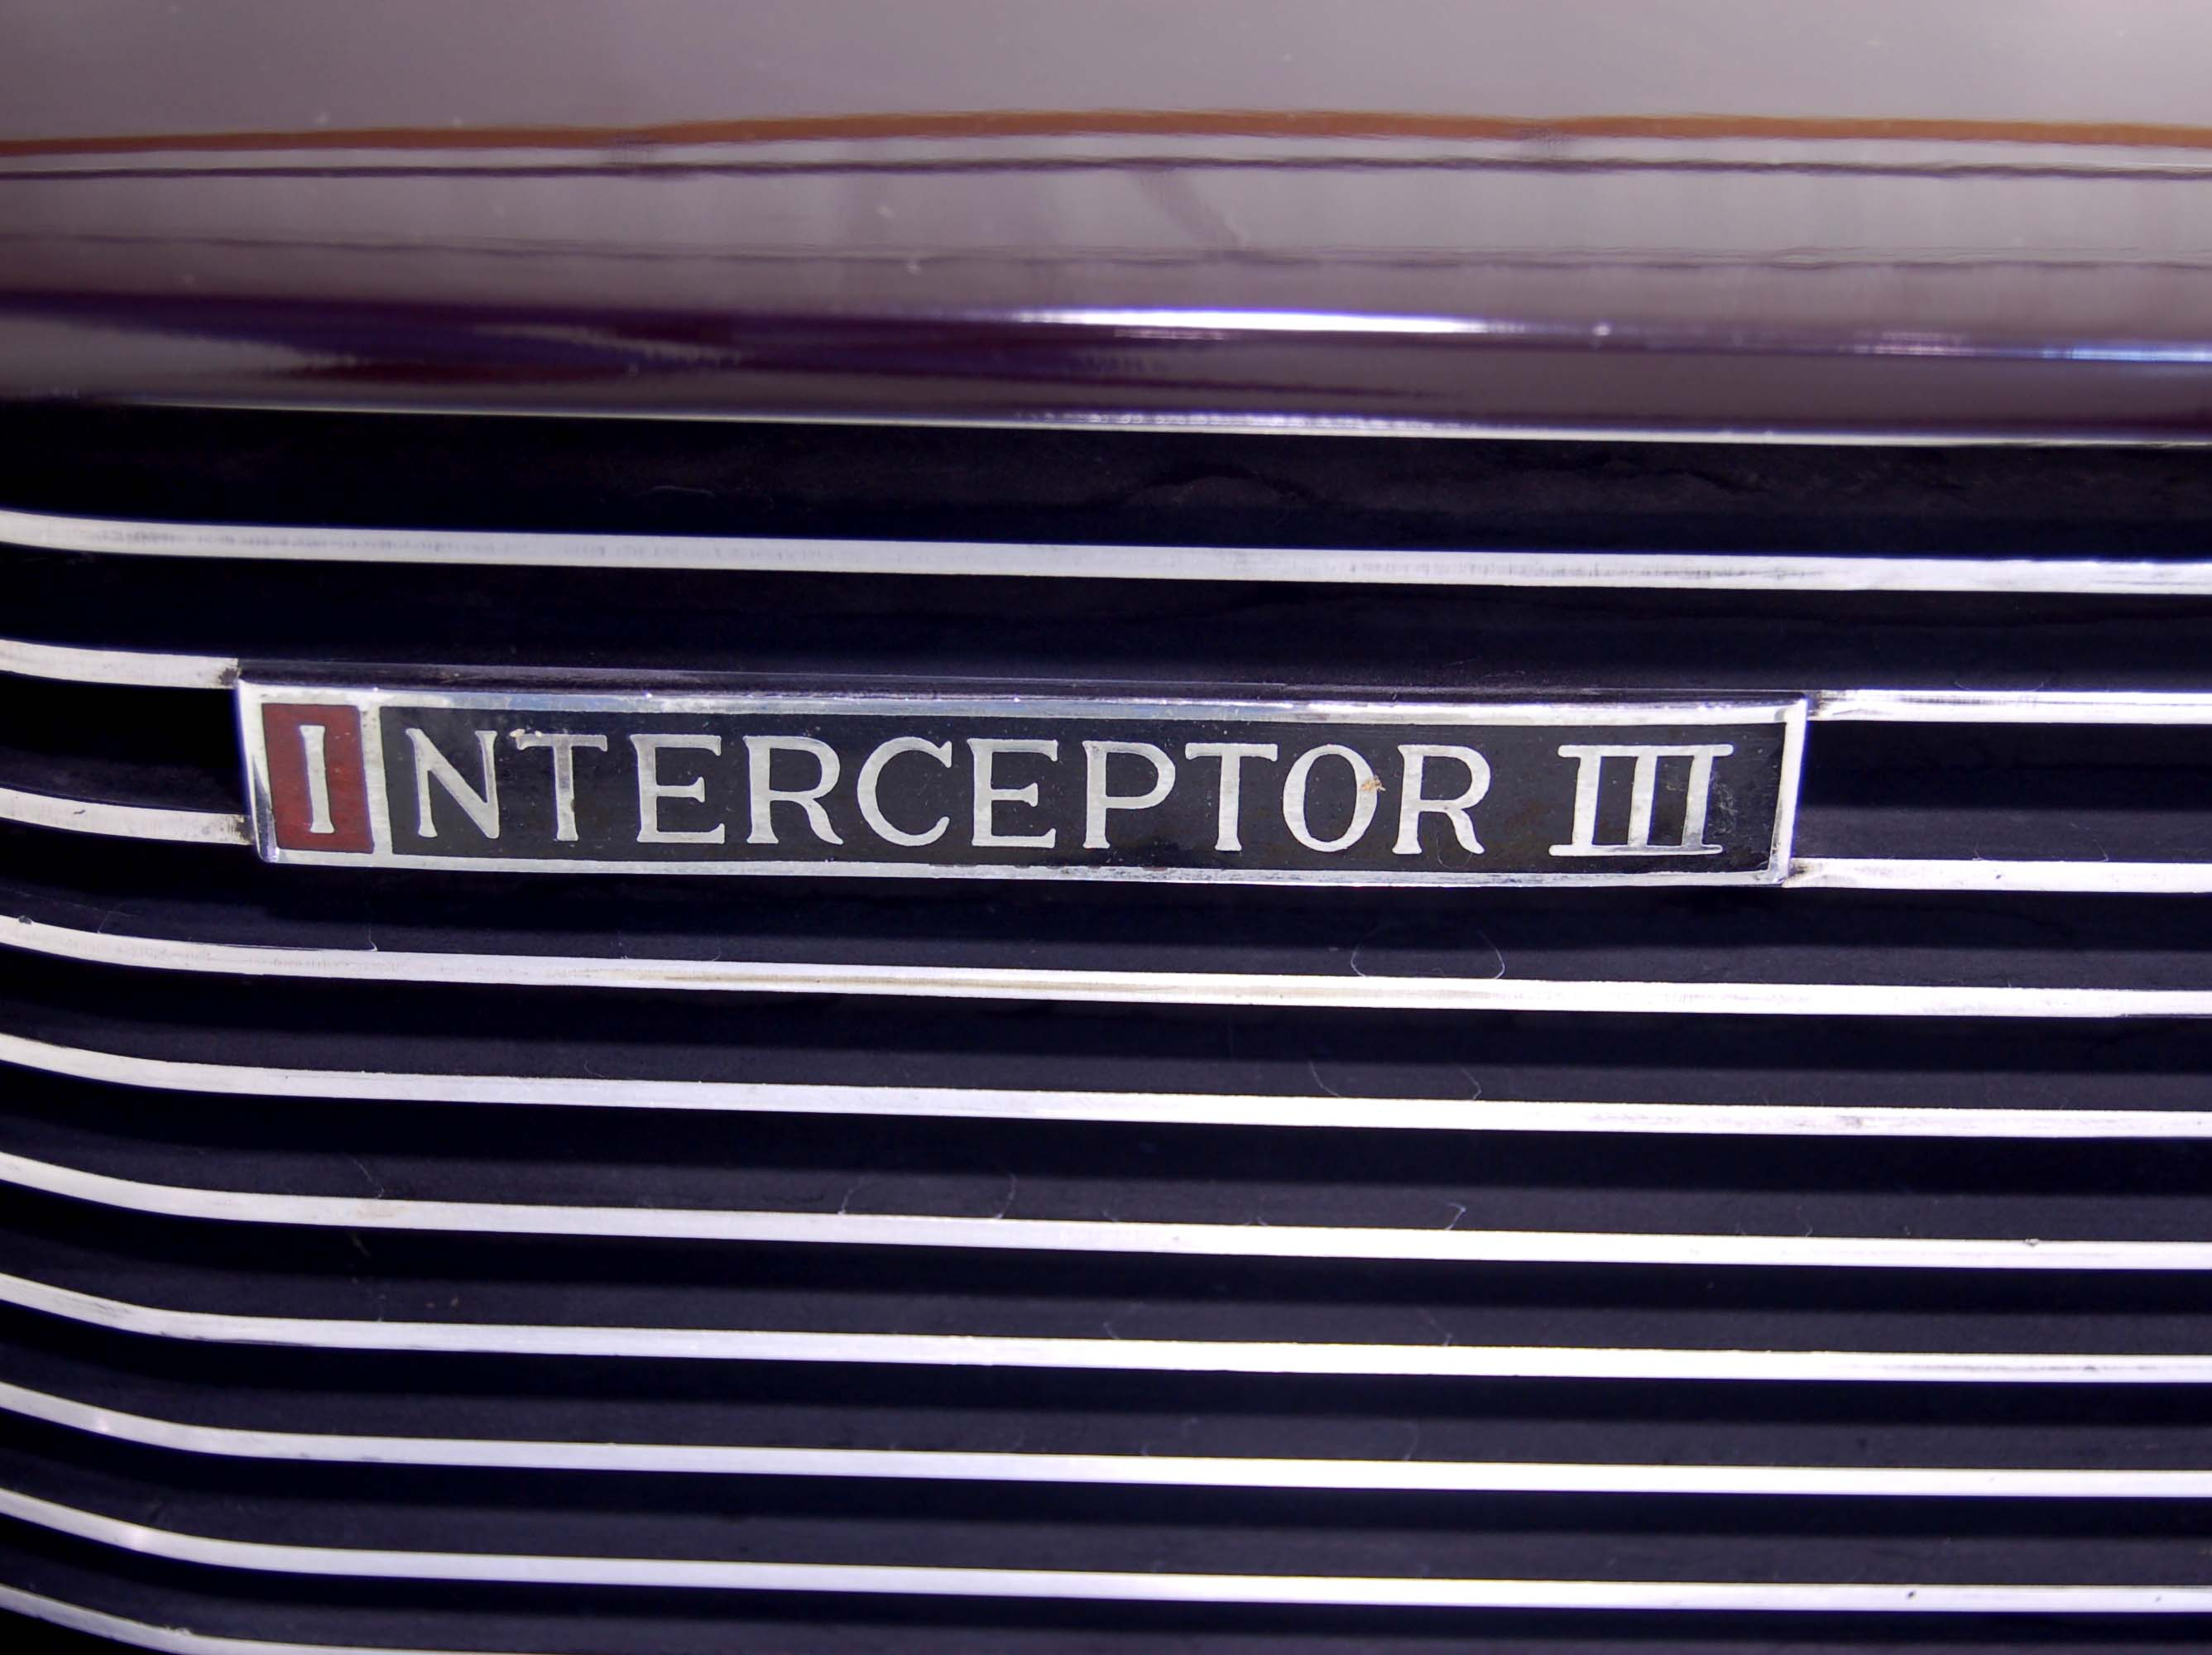 1972 Jensen Interceptor grill badge